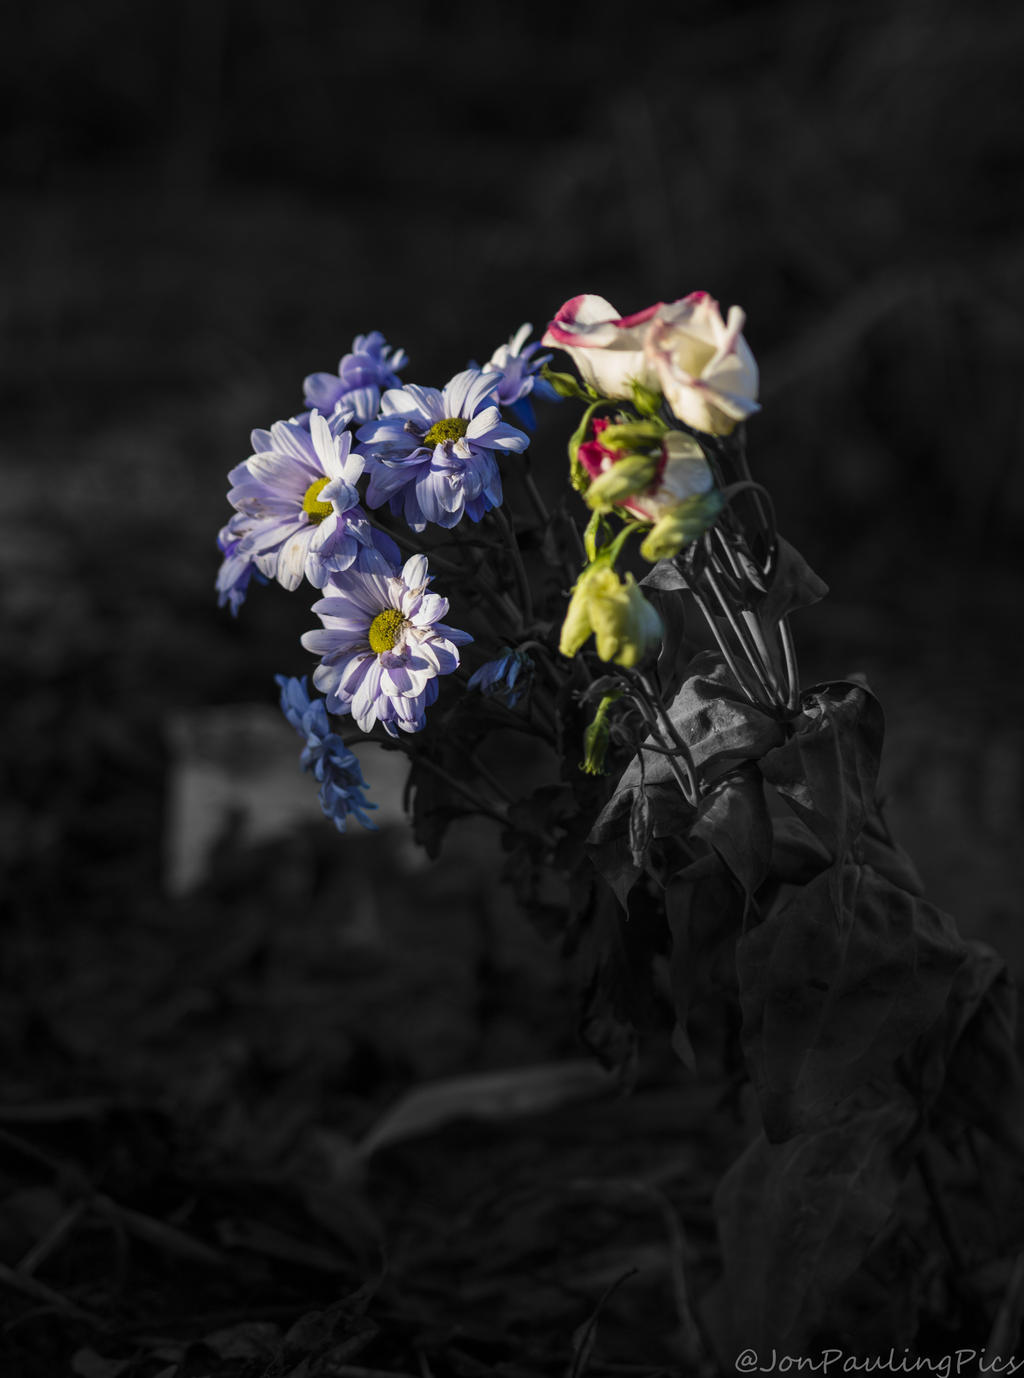 Fading Away by Mincingyoda